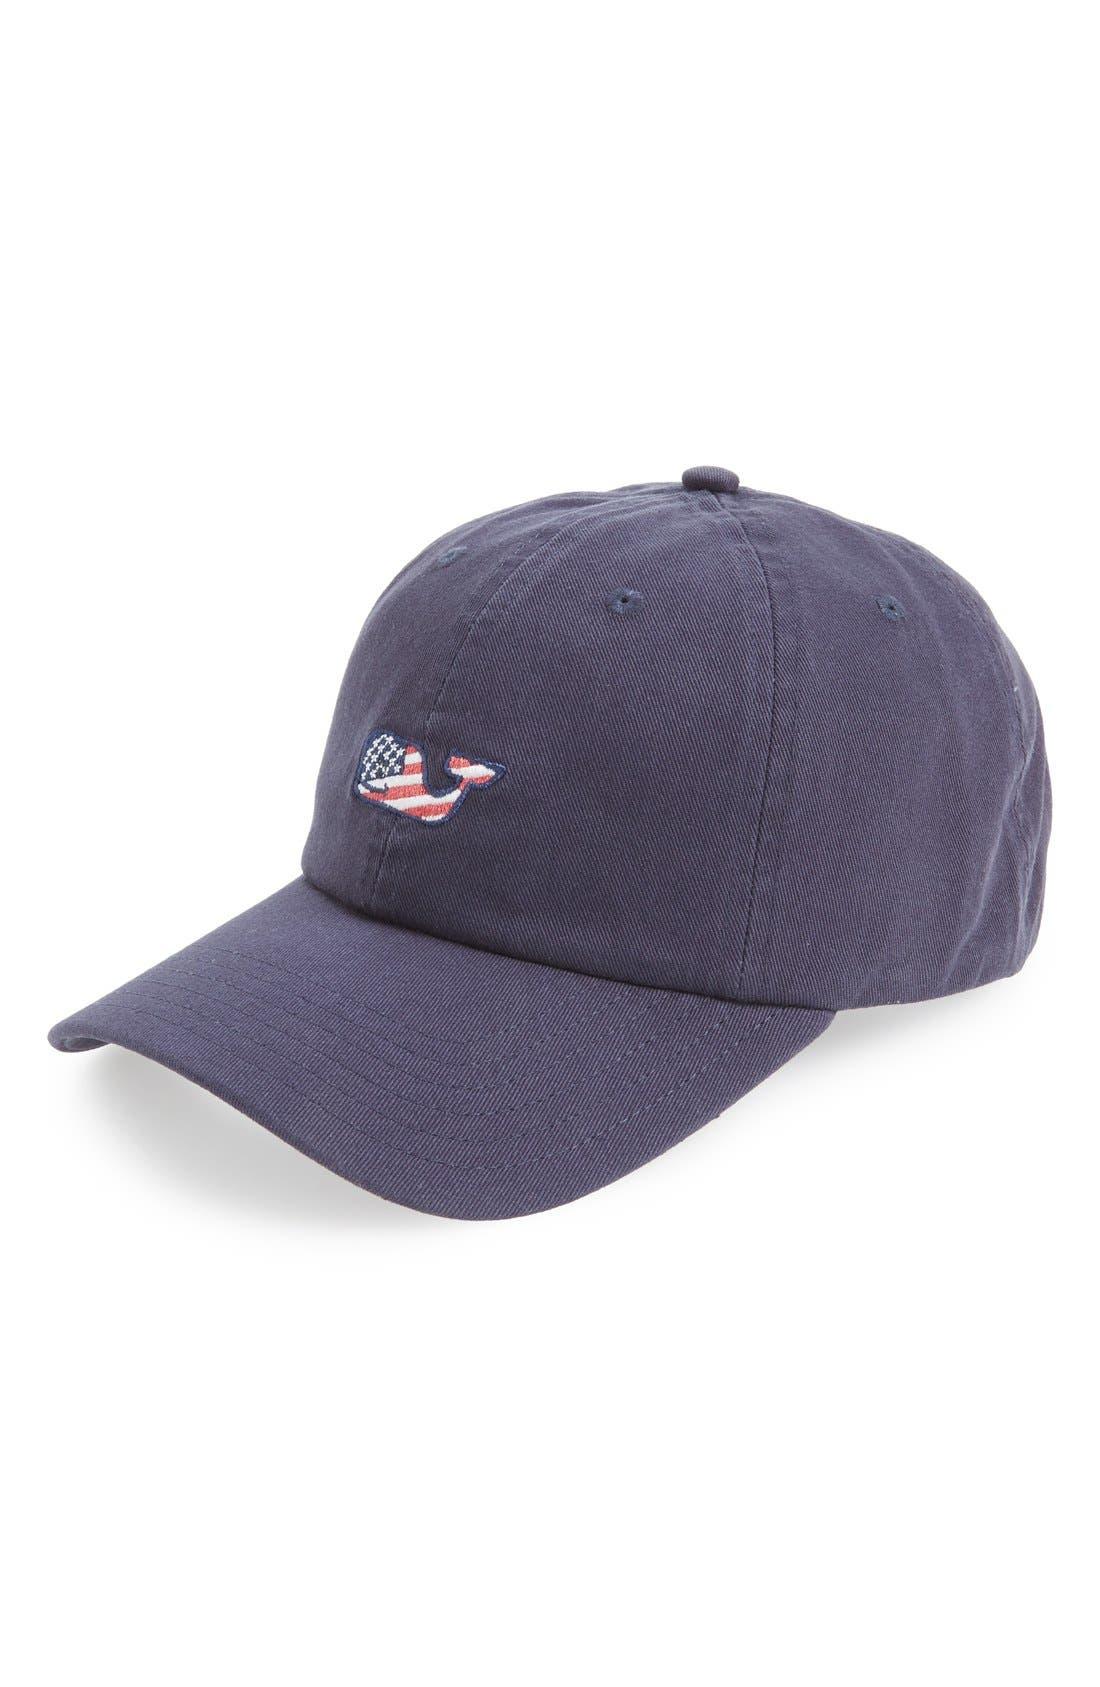 Alternate Image 1 Selected - Vineyard Vines 'Whale Flag' Baseball Cap